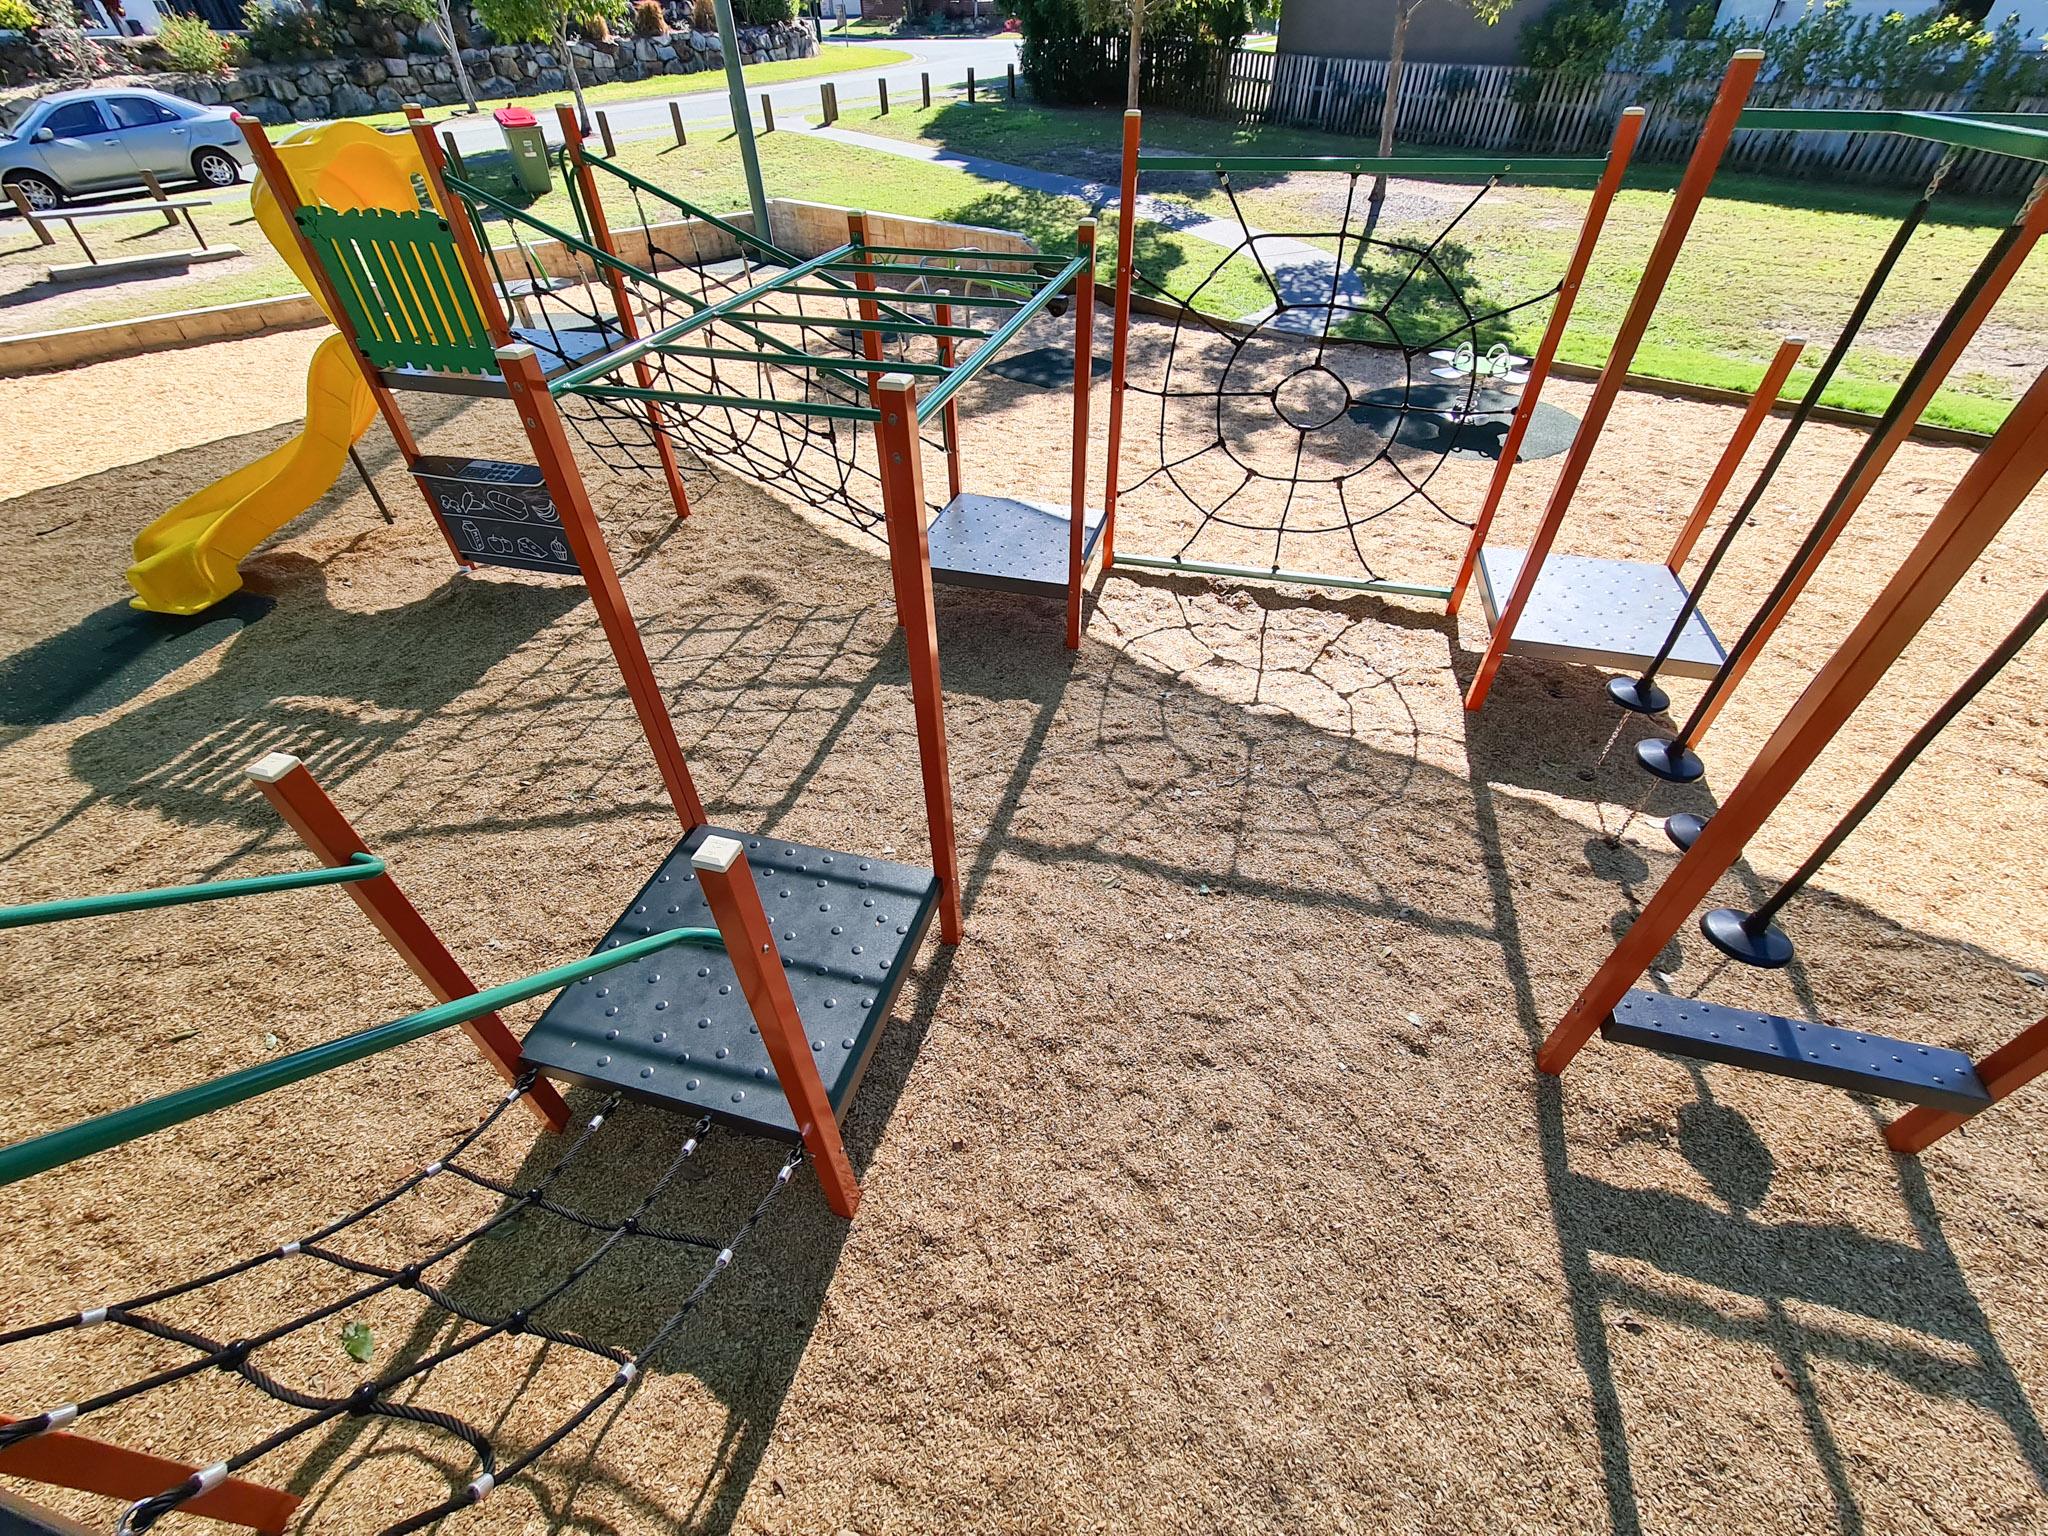 palm-beach-state-school-playrground-austek-play-56